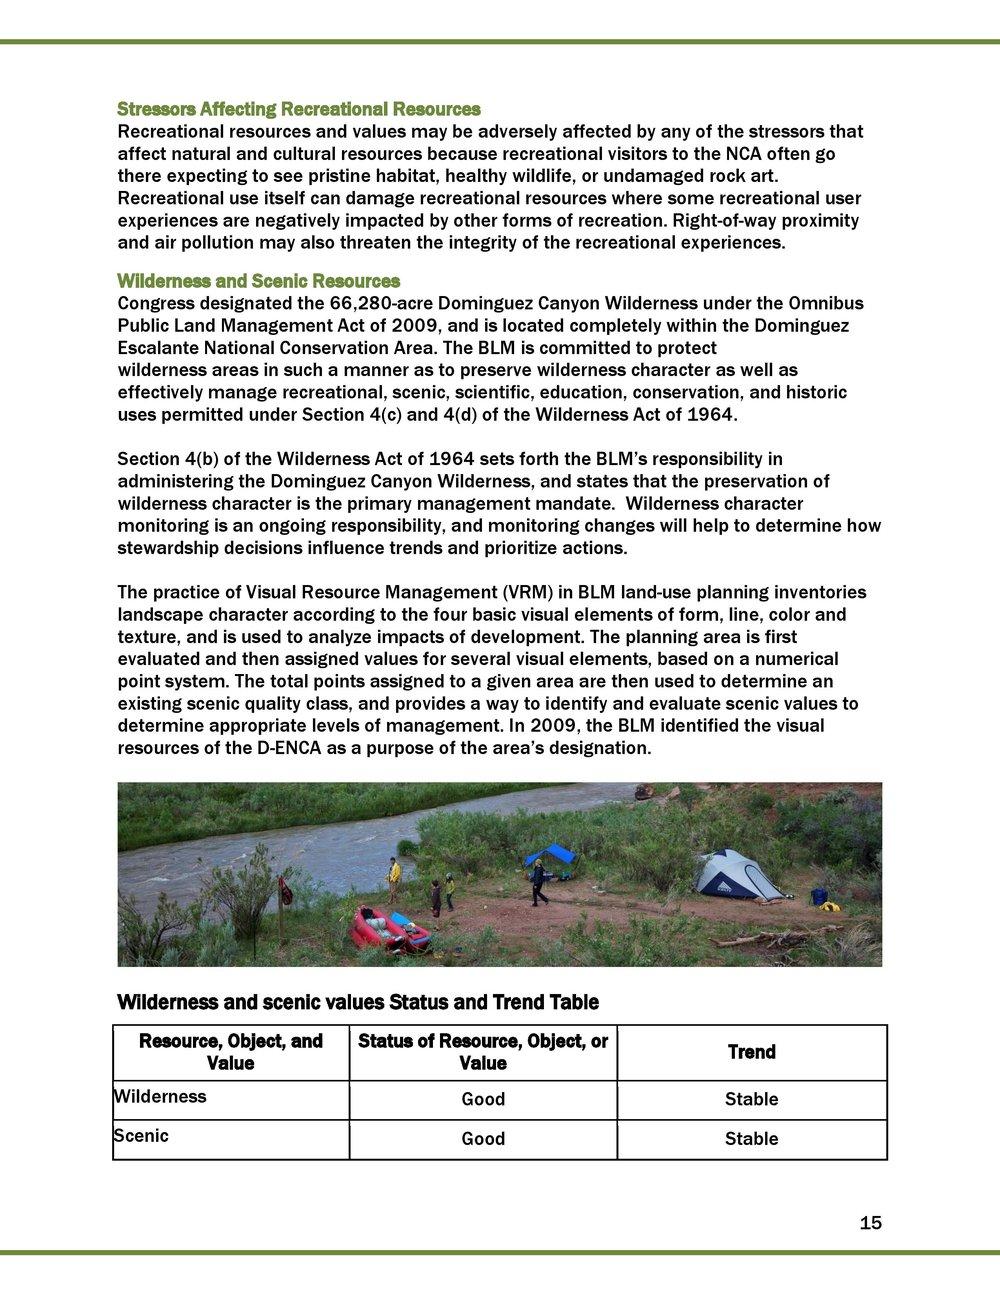 2016 FINAL DENCA REPORT_2017_01_09-page-016.jpg